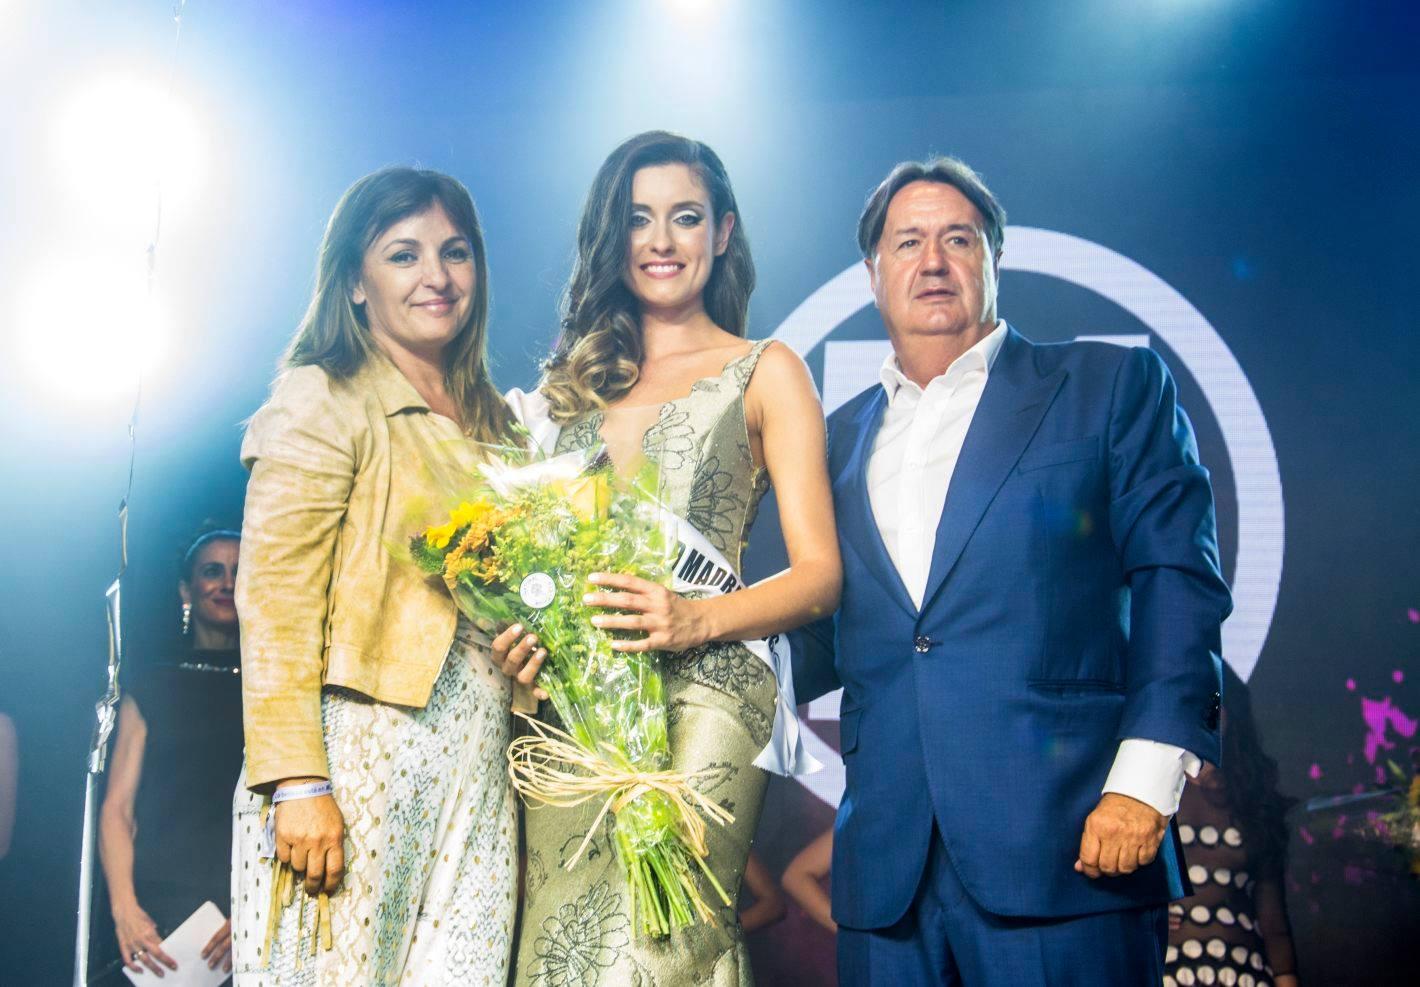 Miss_World_Madrid_Spain_Clinica_Menorca (2)